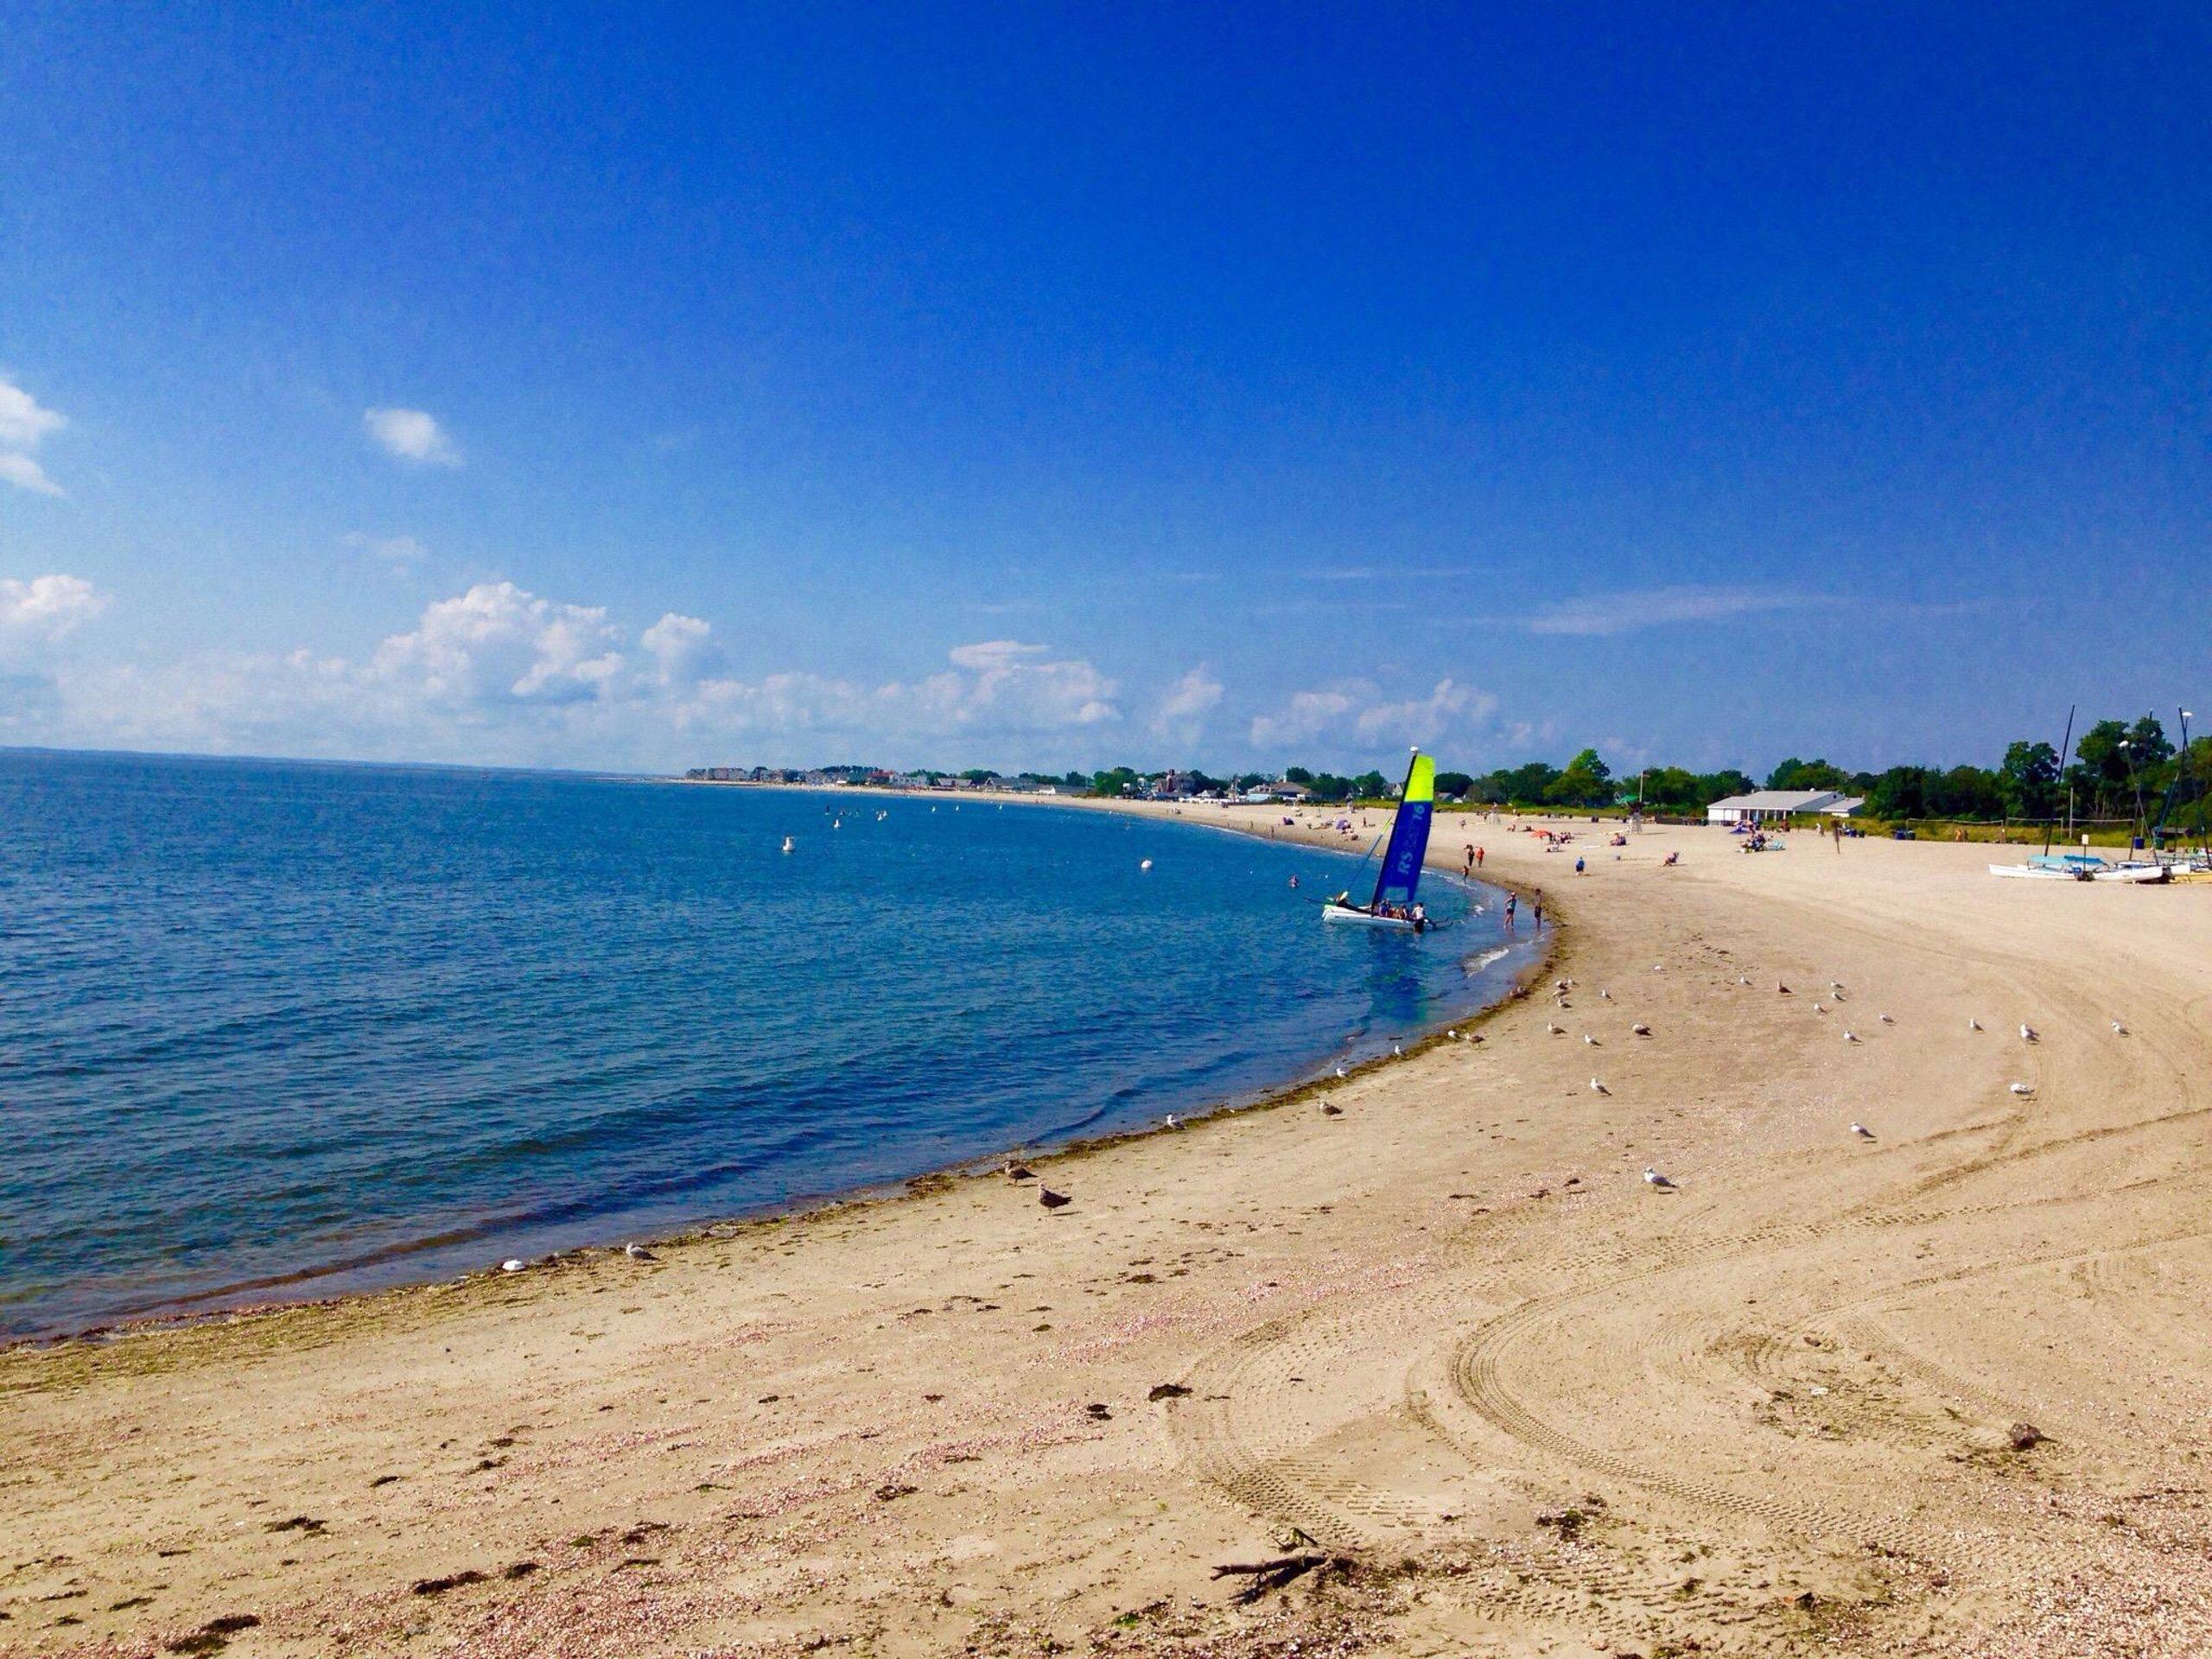 Jennings Beach Fairfield 2020 All